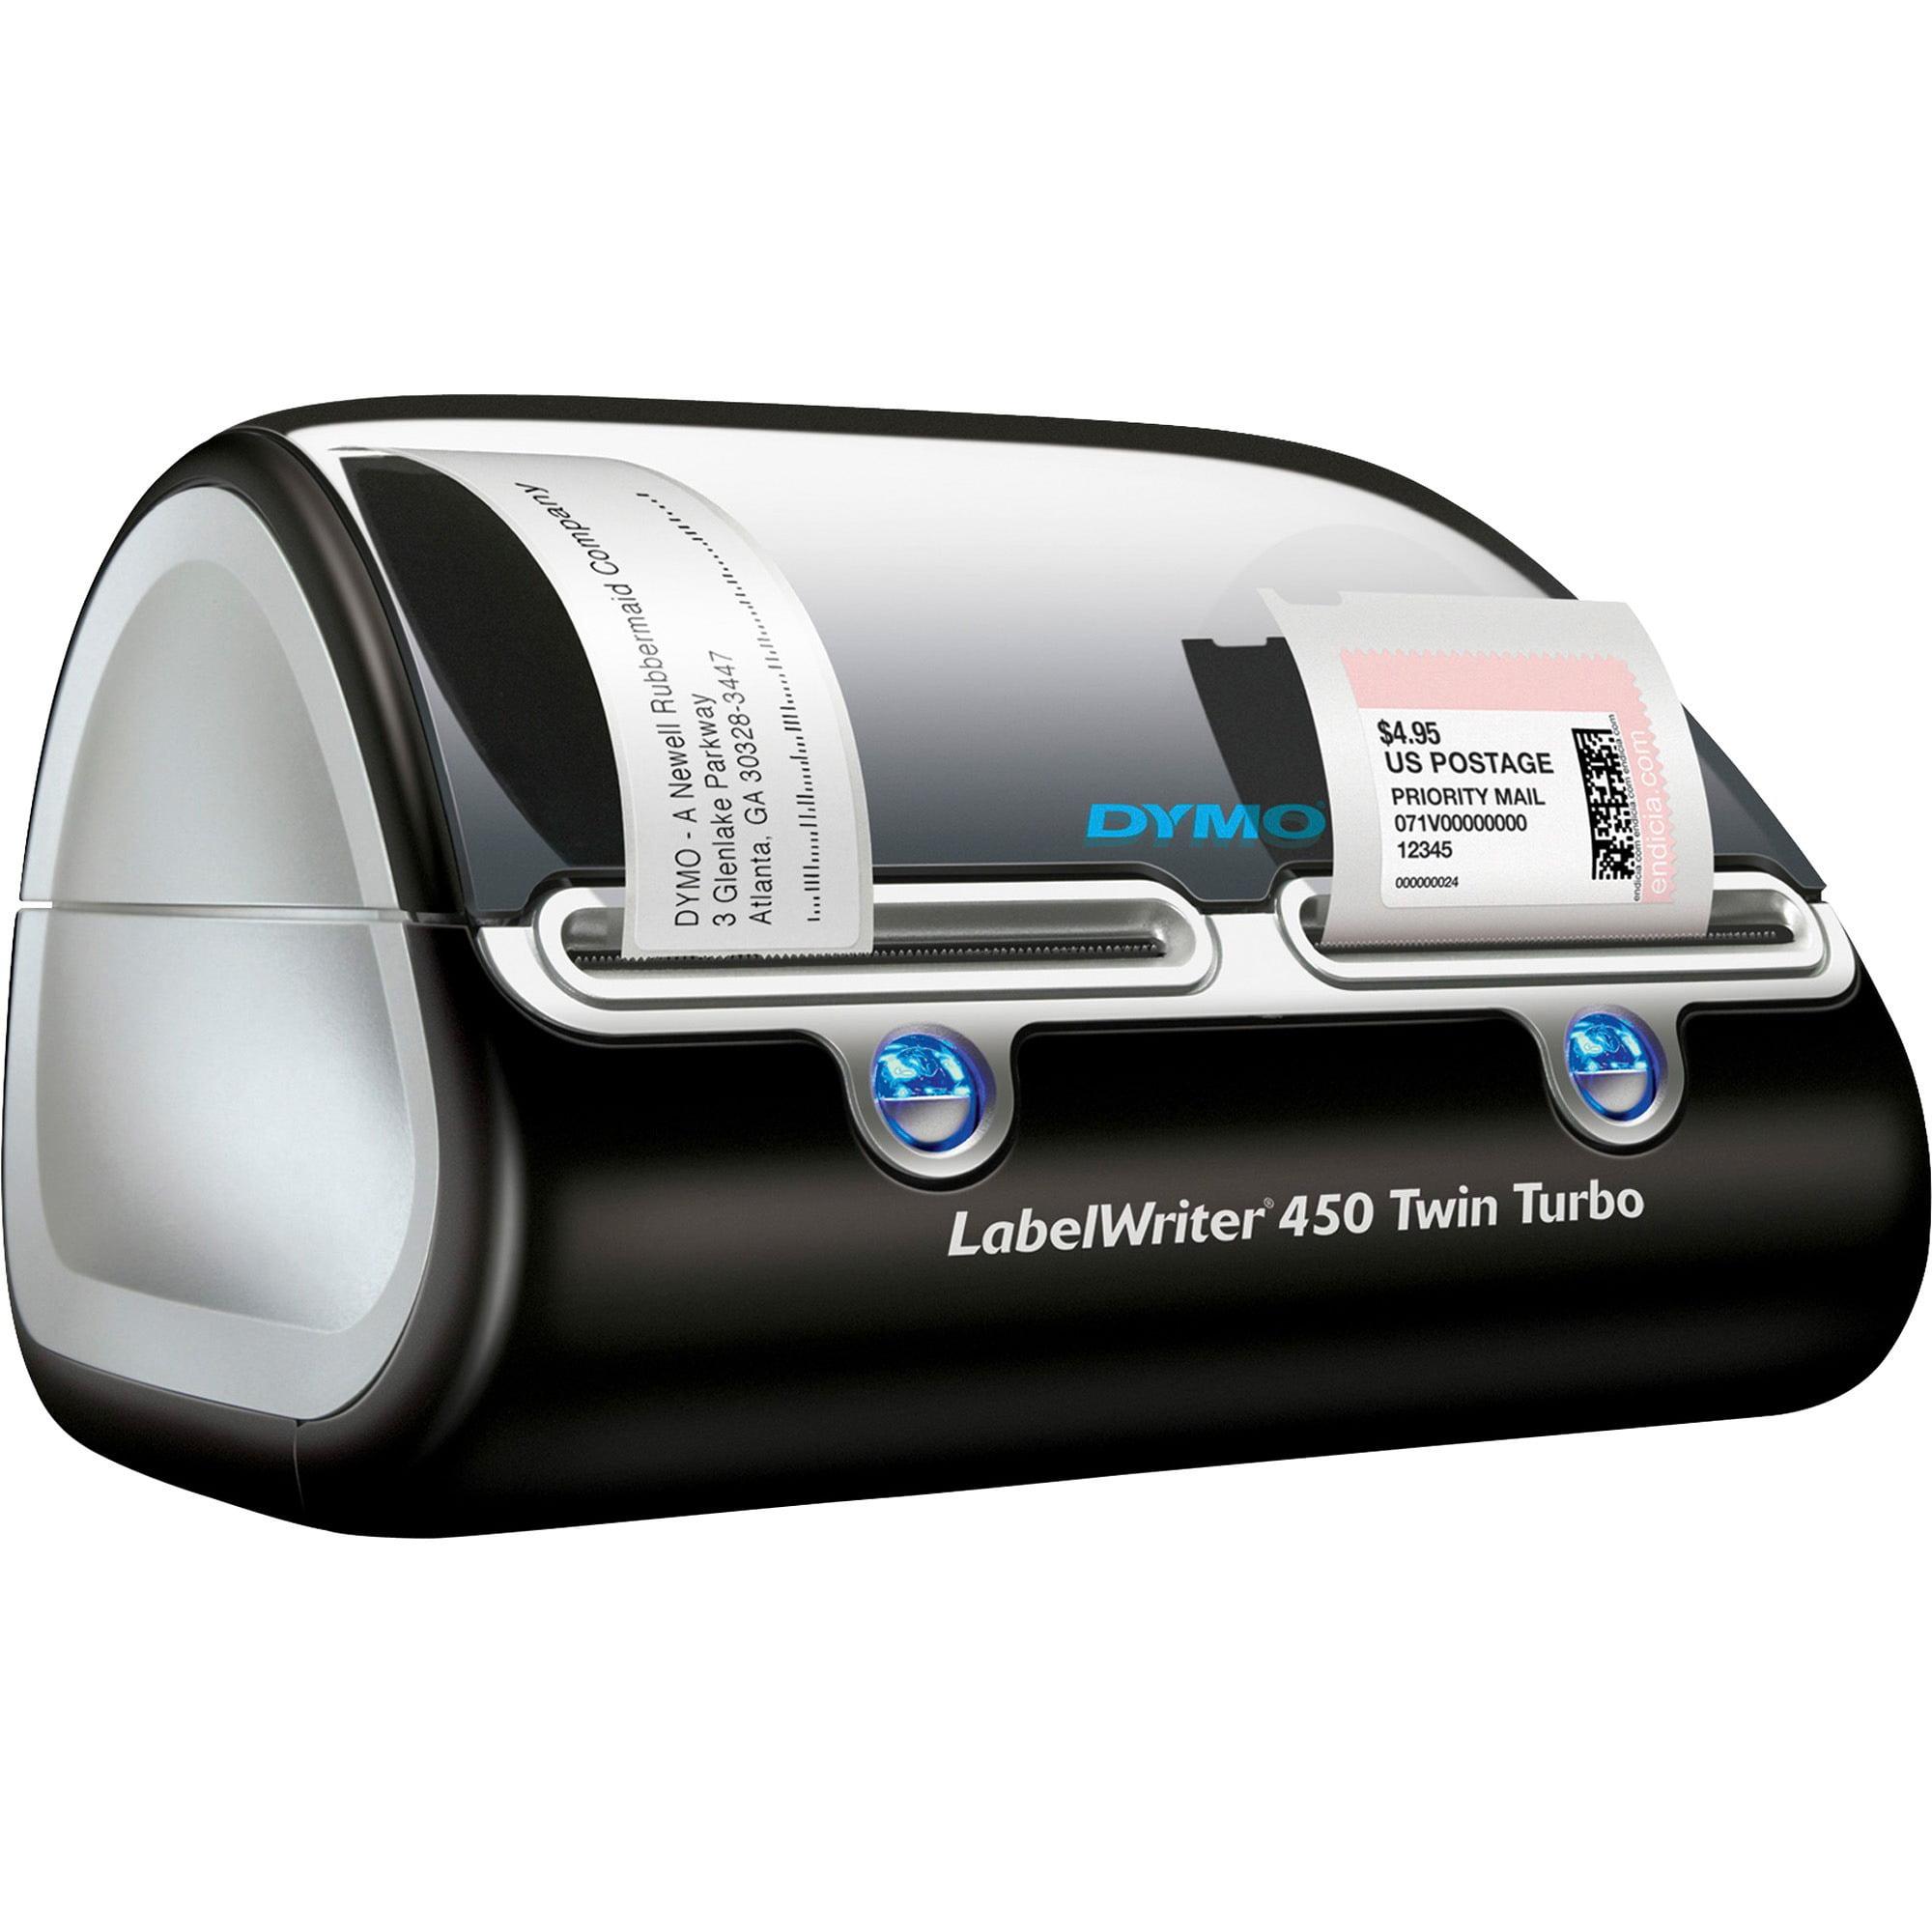 DYMO LabelWriter 450 Twin Turbo Thermal Label Maker